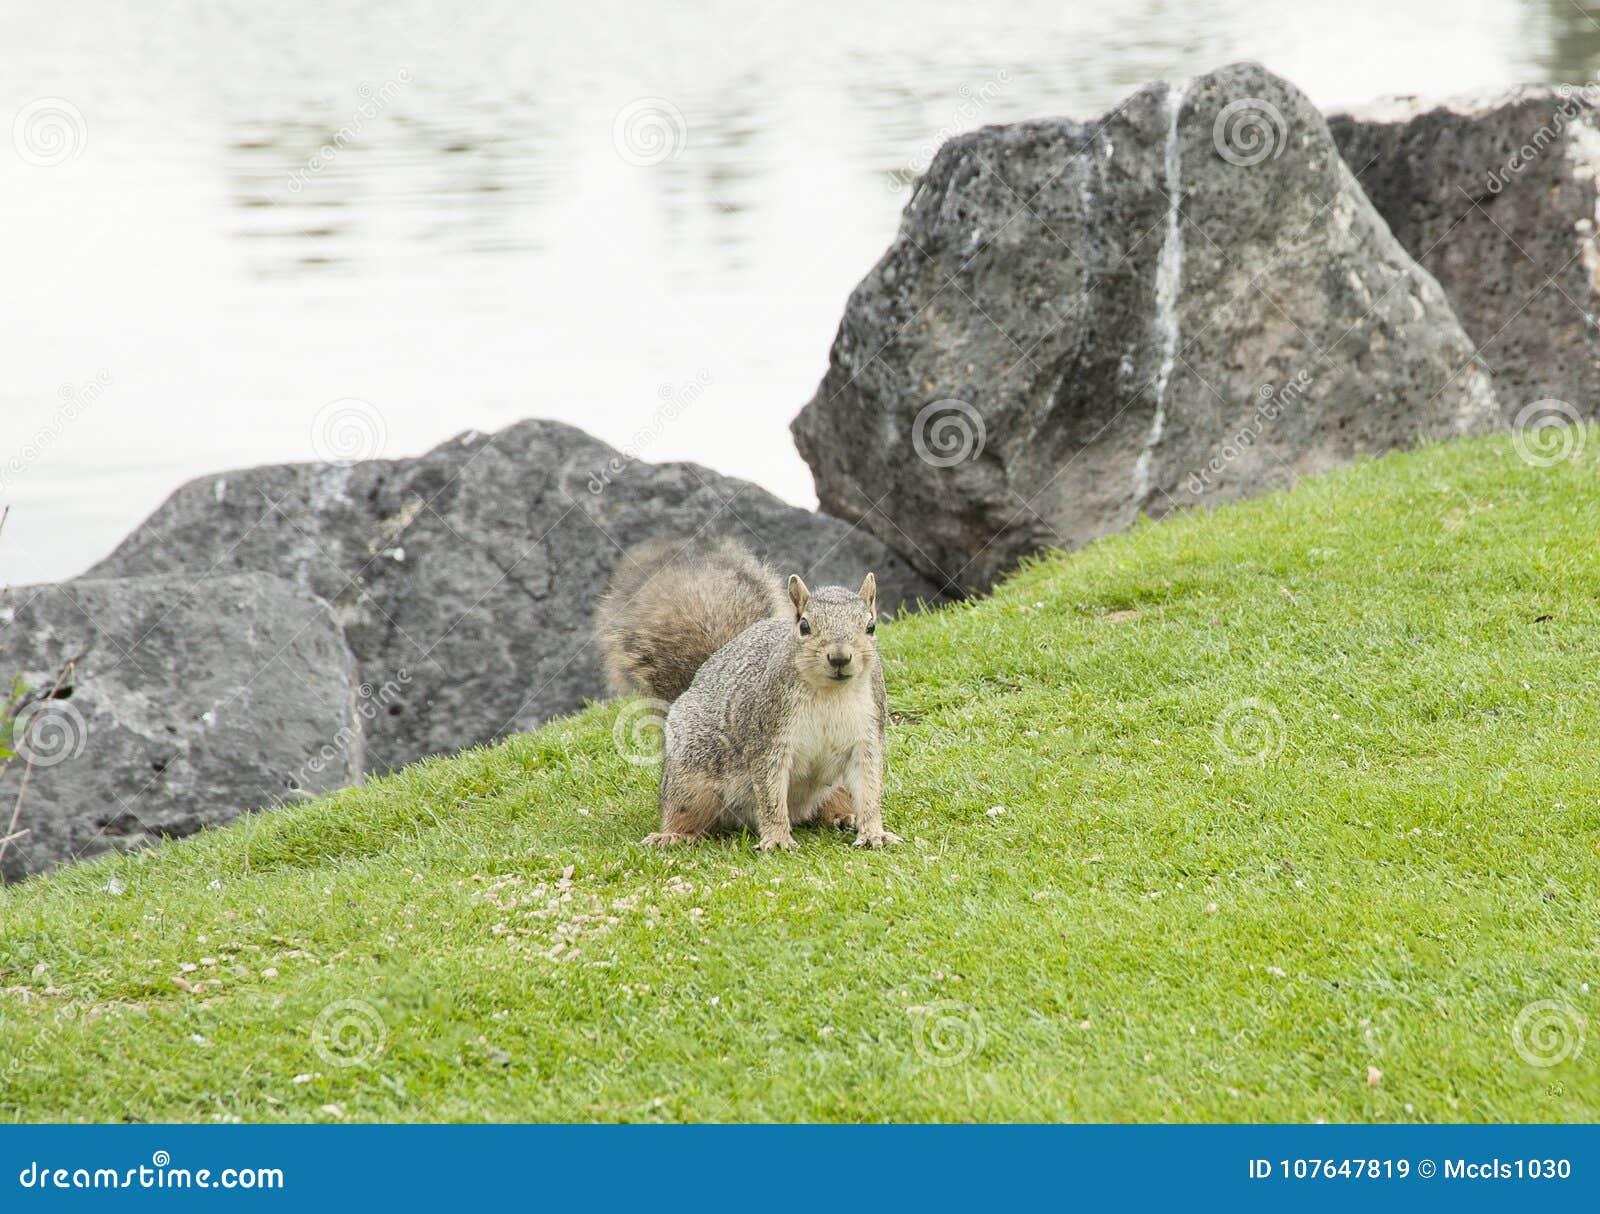 Squirrel On Idaho Falls Greenbelt Stock Image - Image of